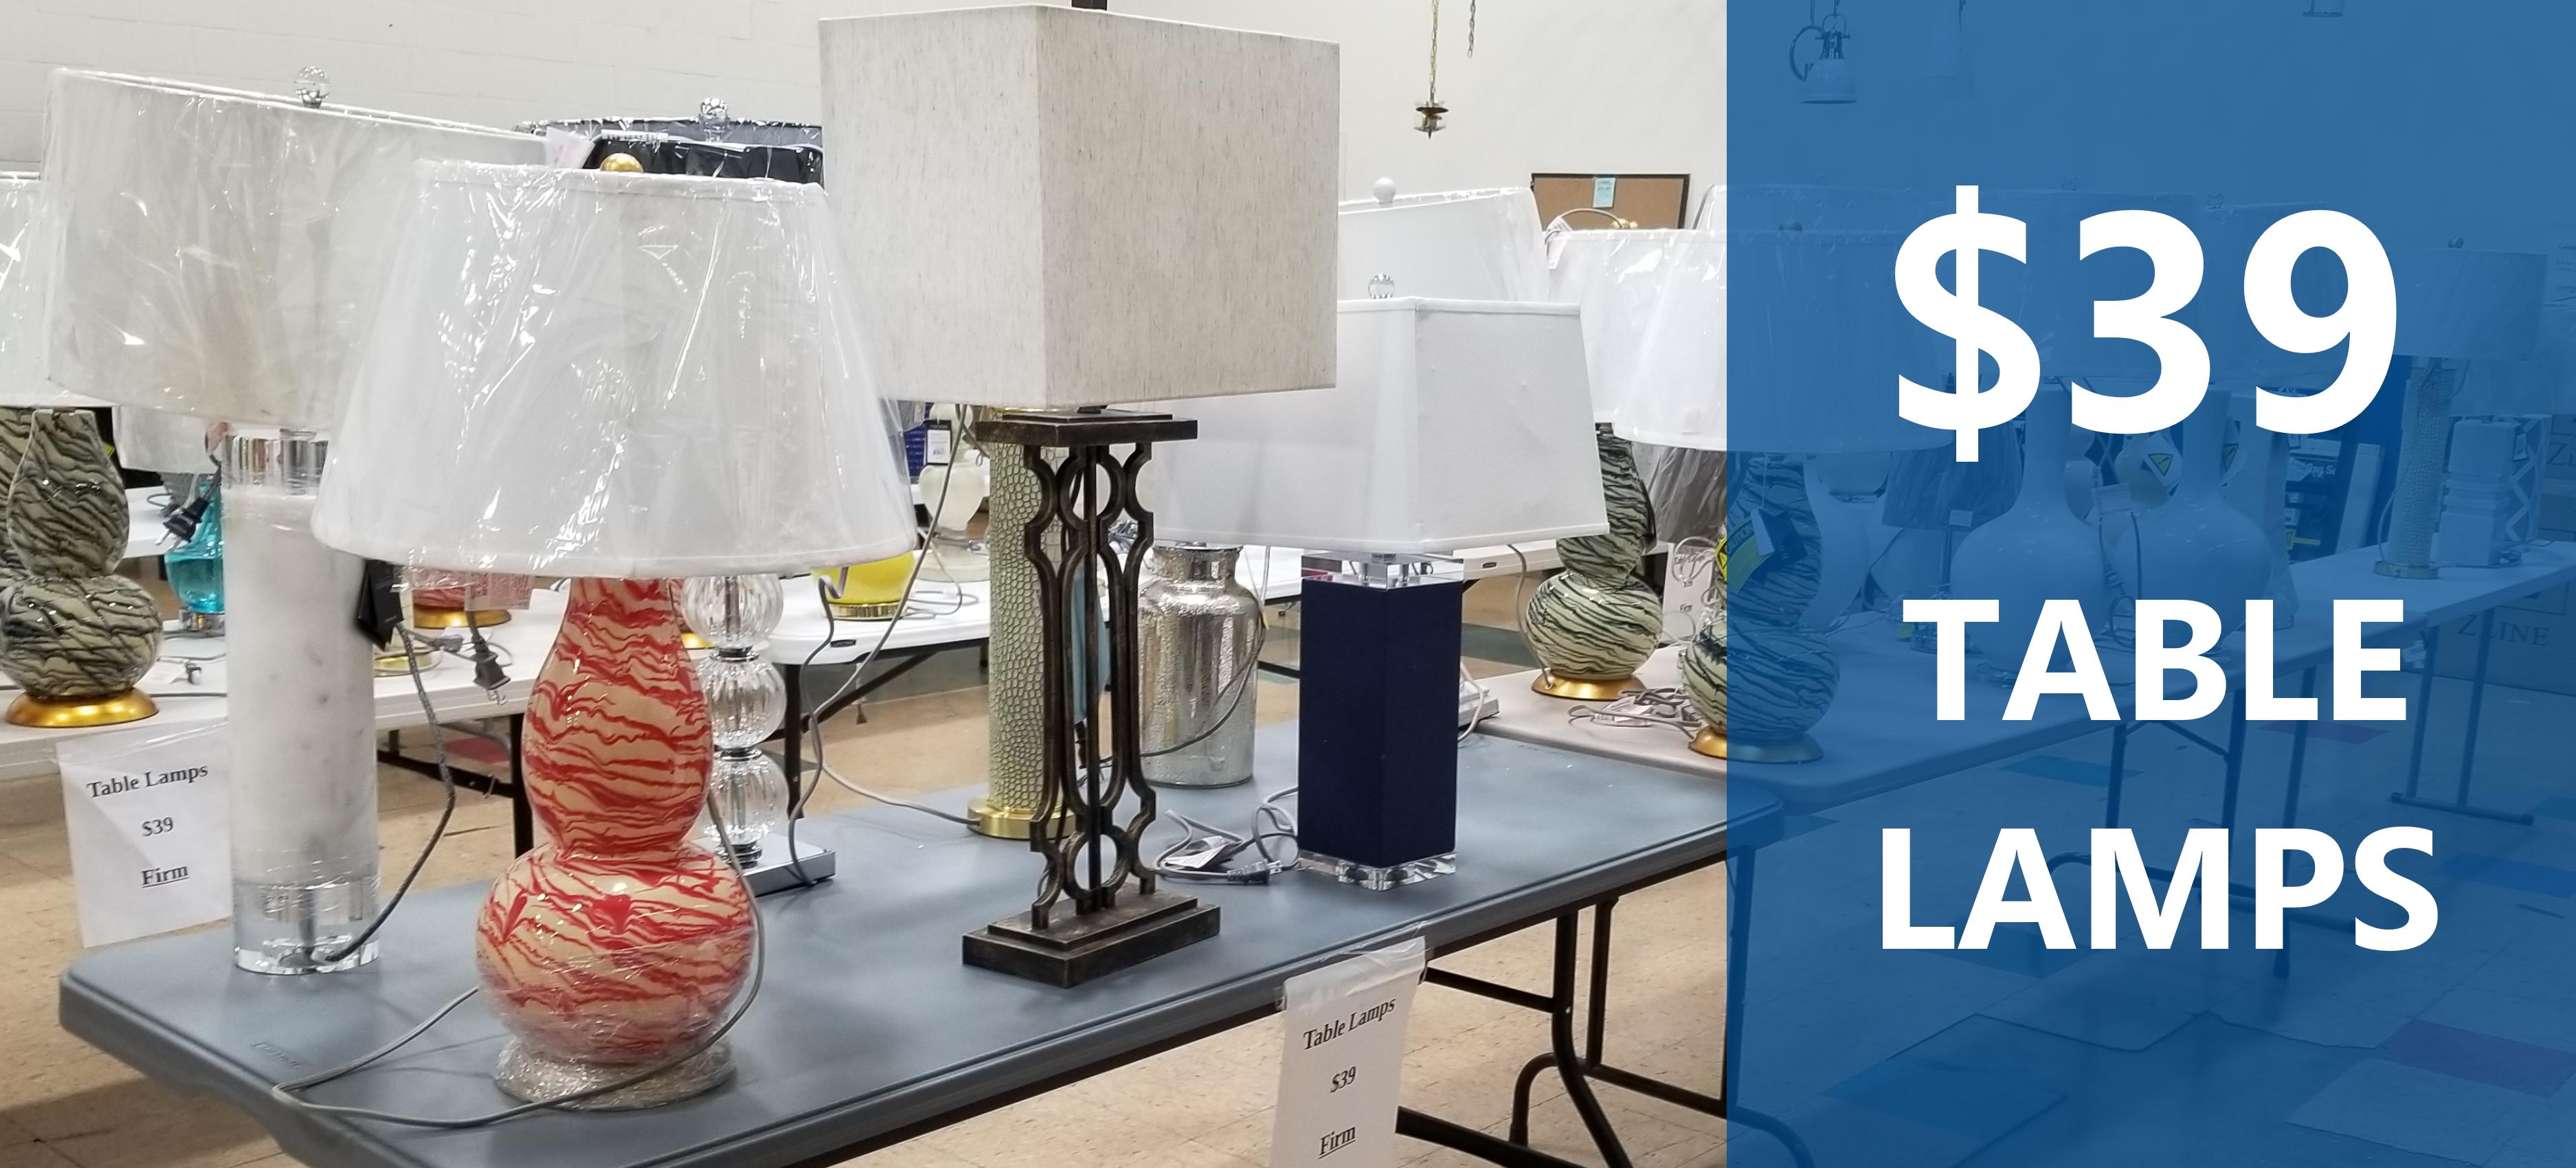 table-lamps.1.jpg